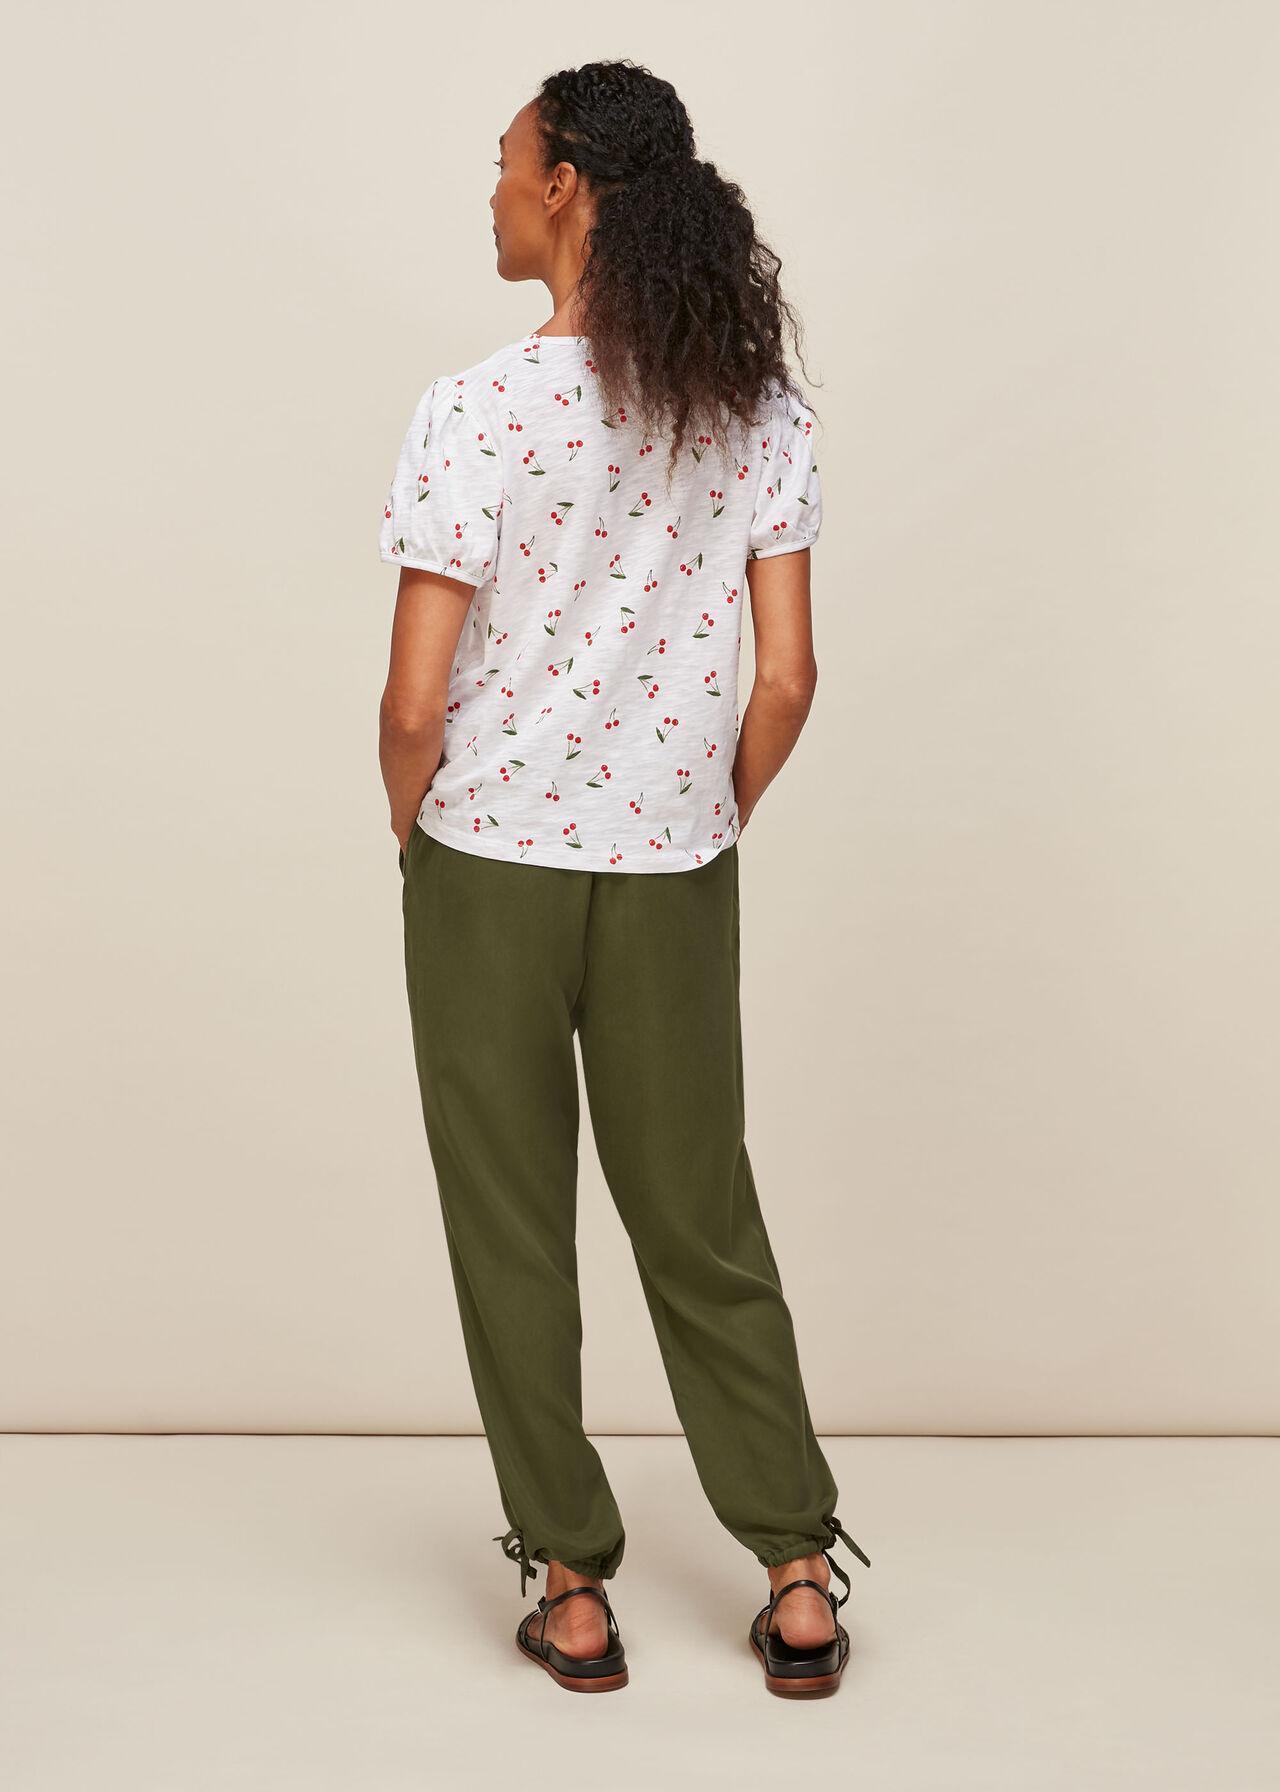 Puff Sleeve Cherry Tshirt